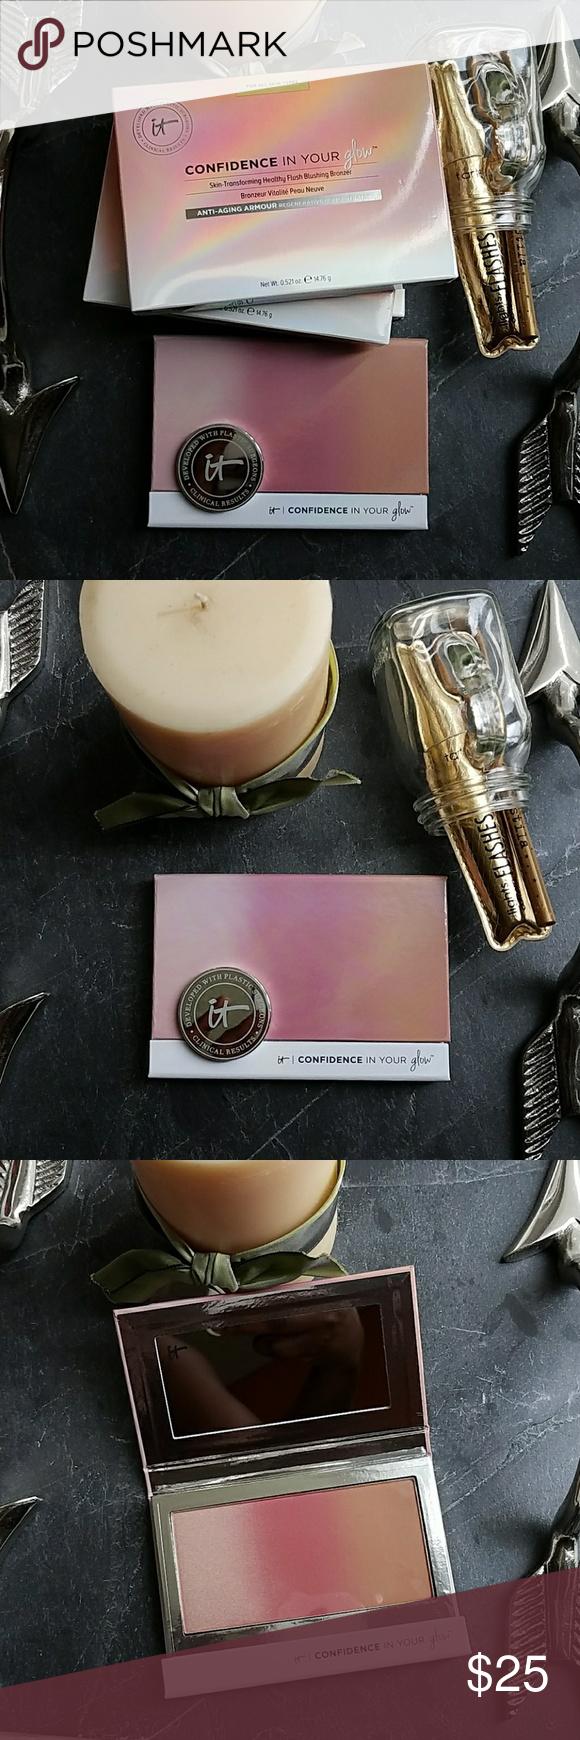 IT Cosmetics Transforming Healthy Blush Bronzer This blush